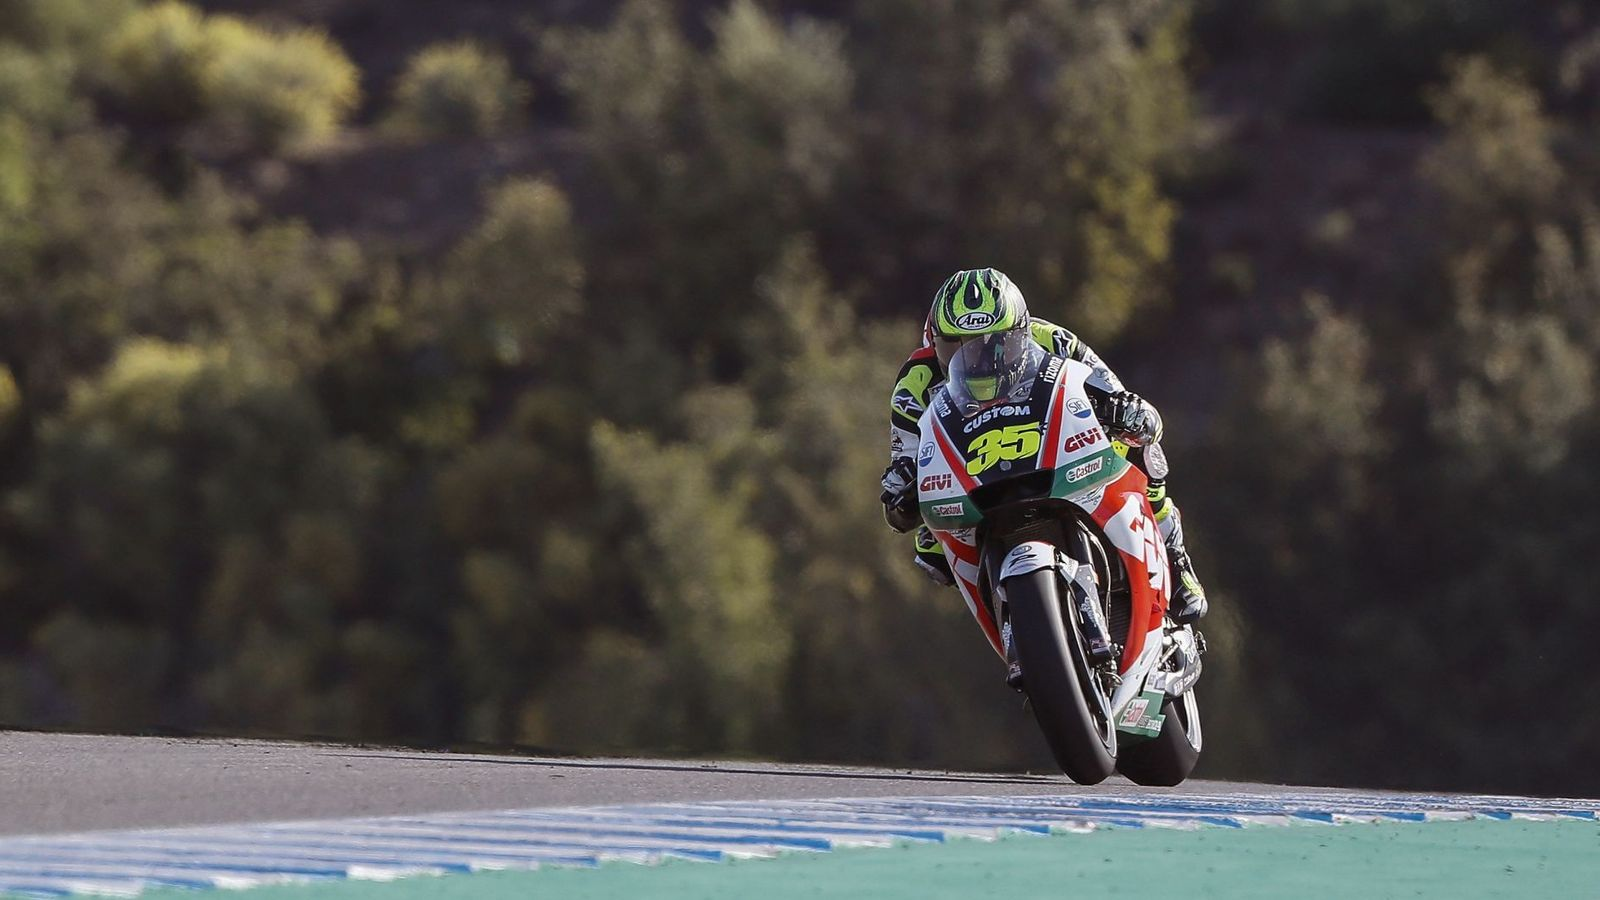 Foto: Cal Crutchlow batió el récord de MotoGP en el Circuito de Jerez Ángel Nieto. (EFE)